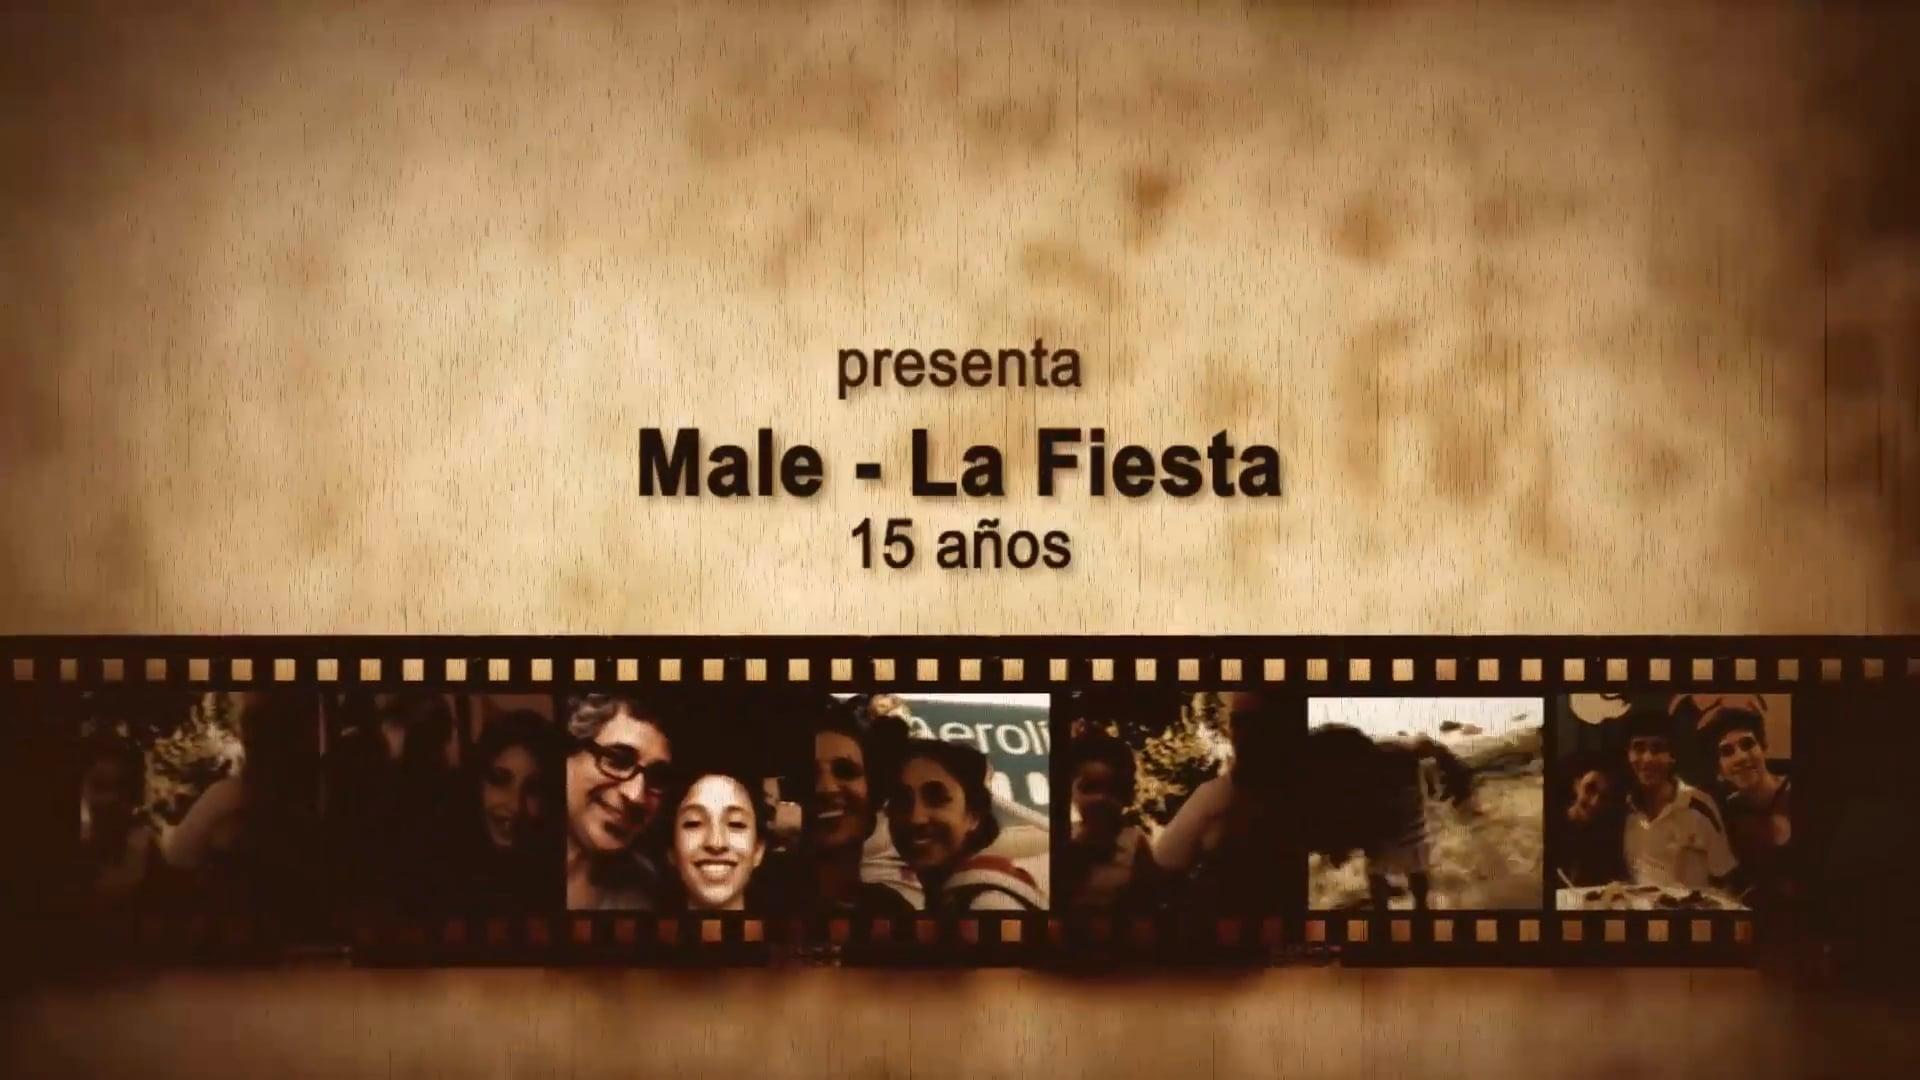 Male - 15 años ¡La Fiesta! - Trailer